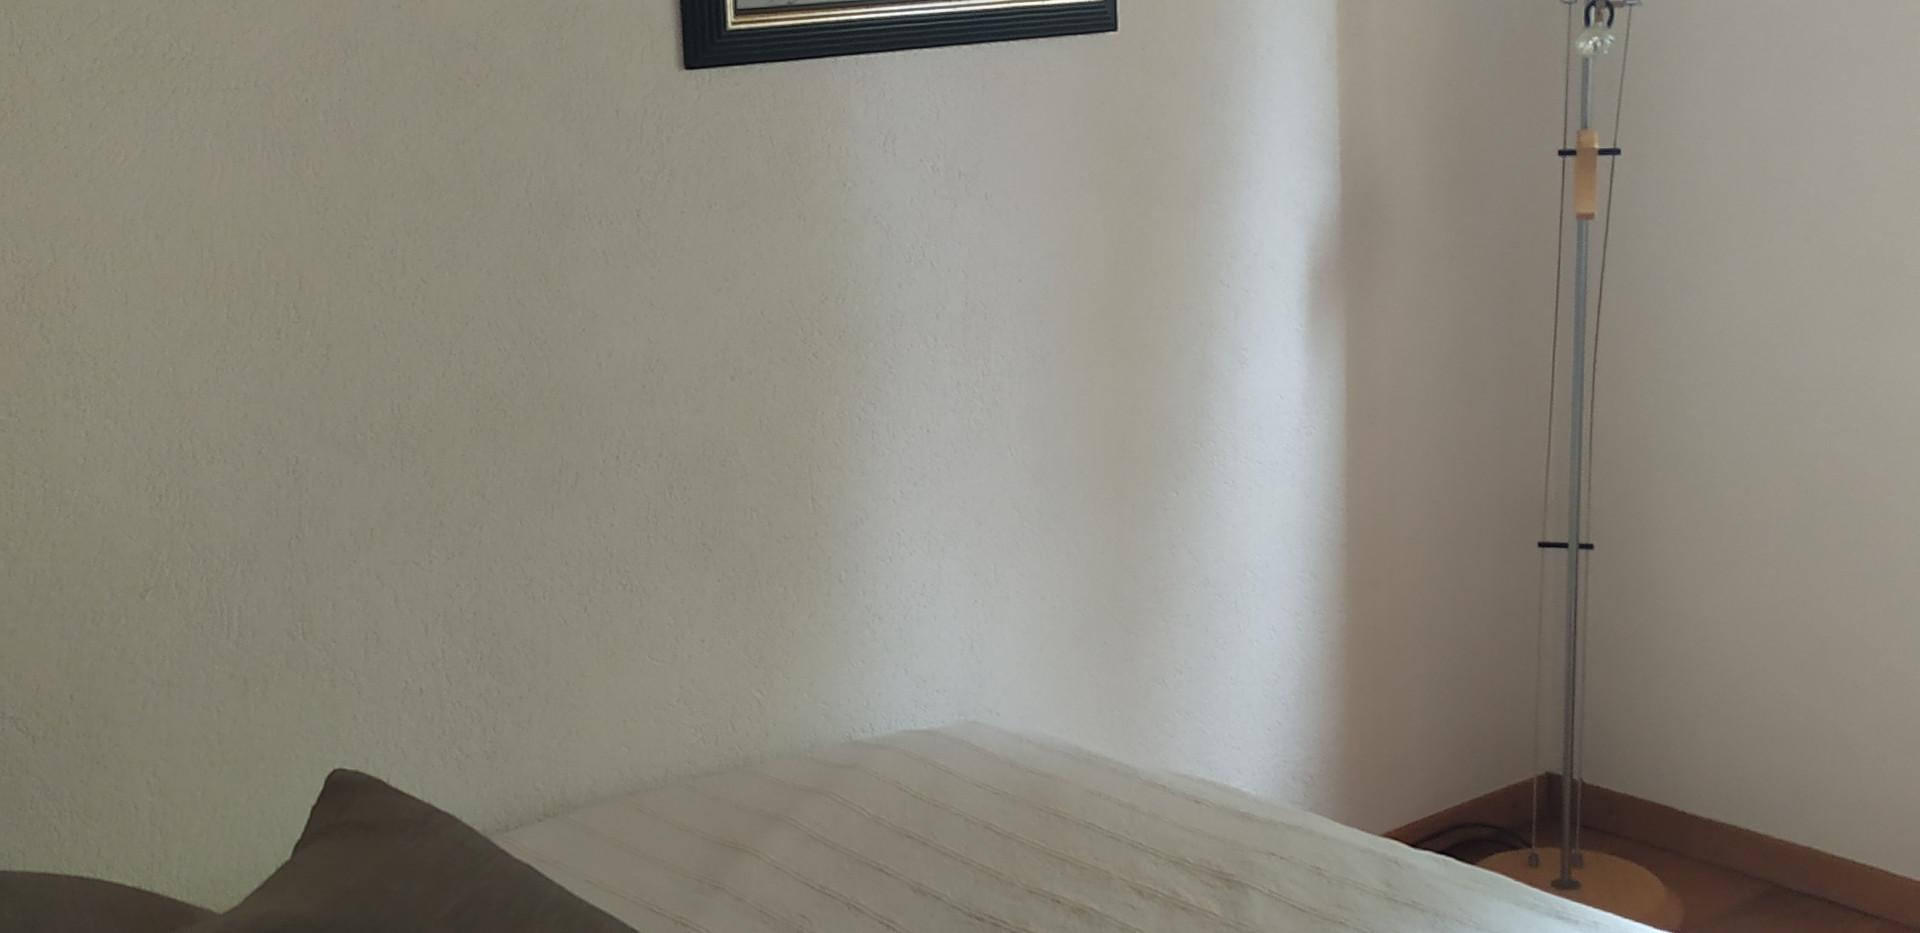 Chambre d'hôtes La Sereine